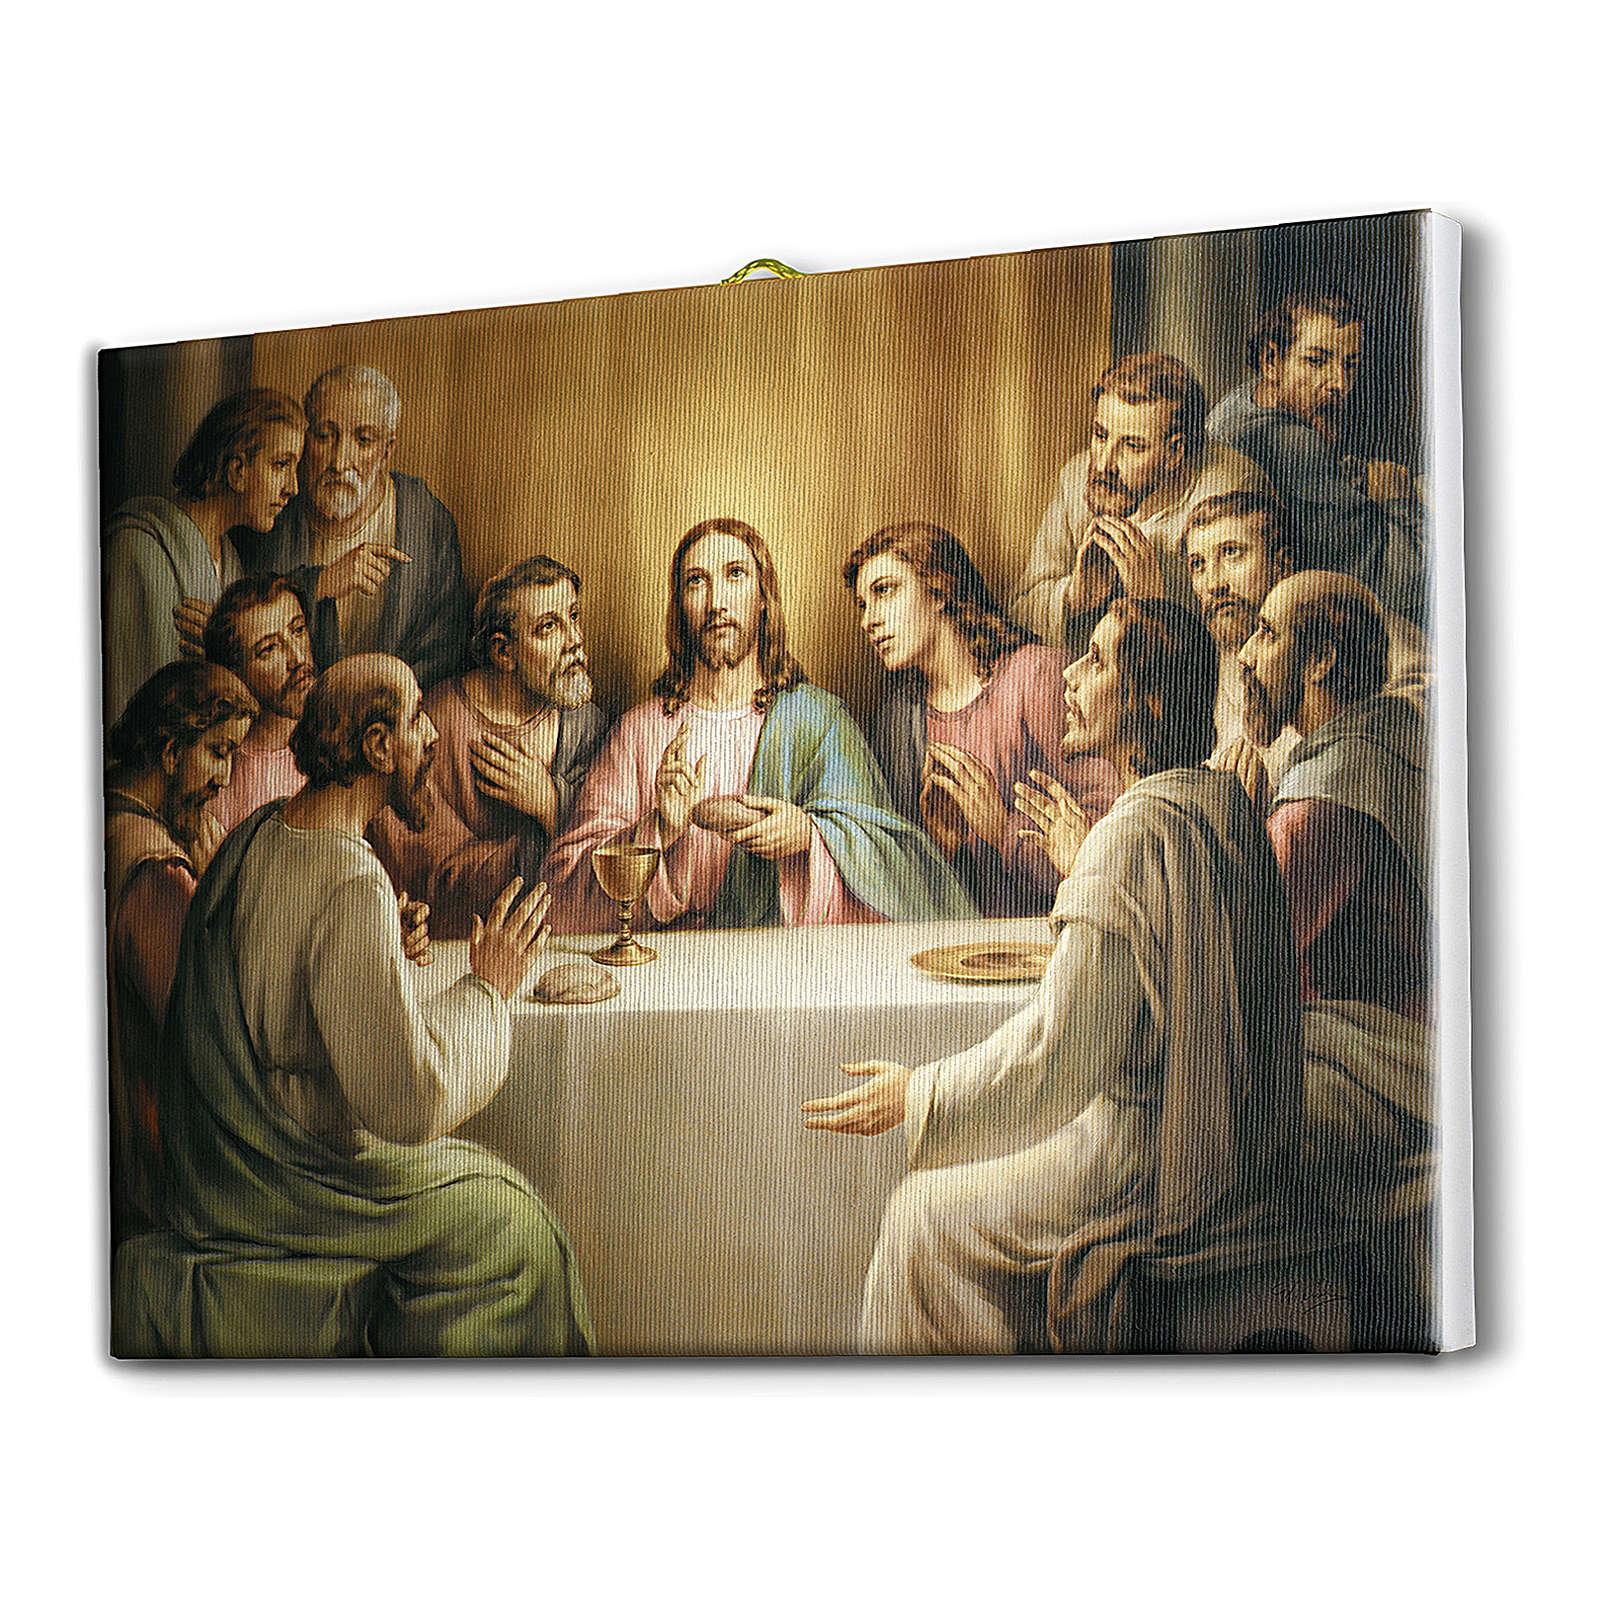 Cadre sur toile Cène 40x30 cm 3